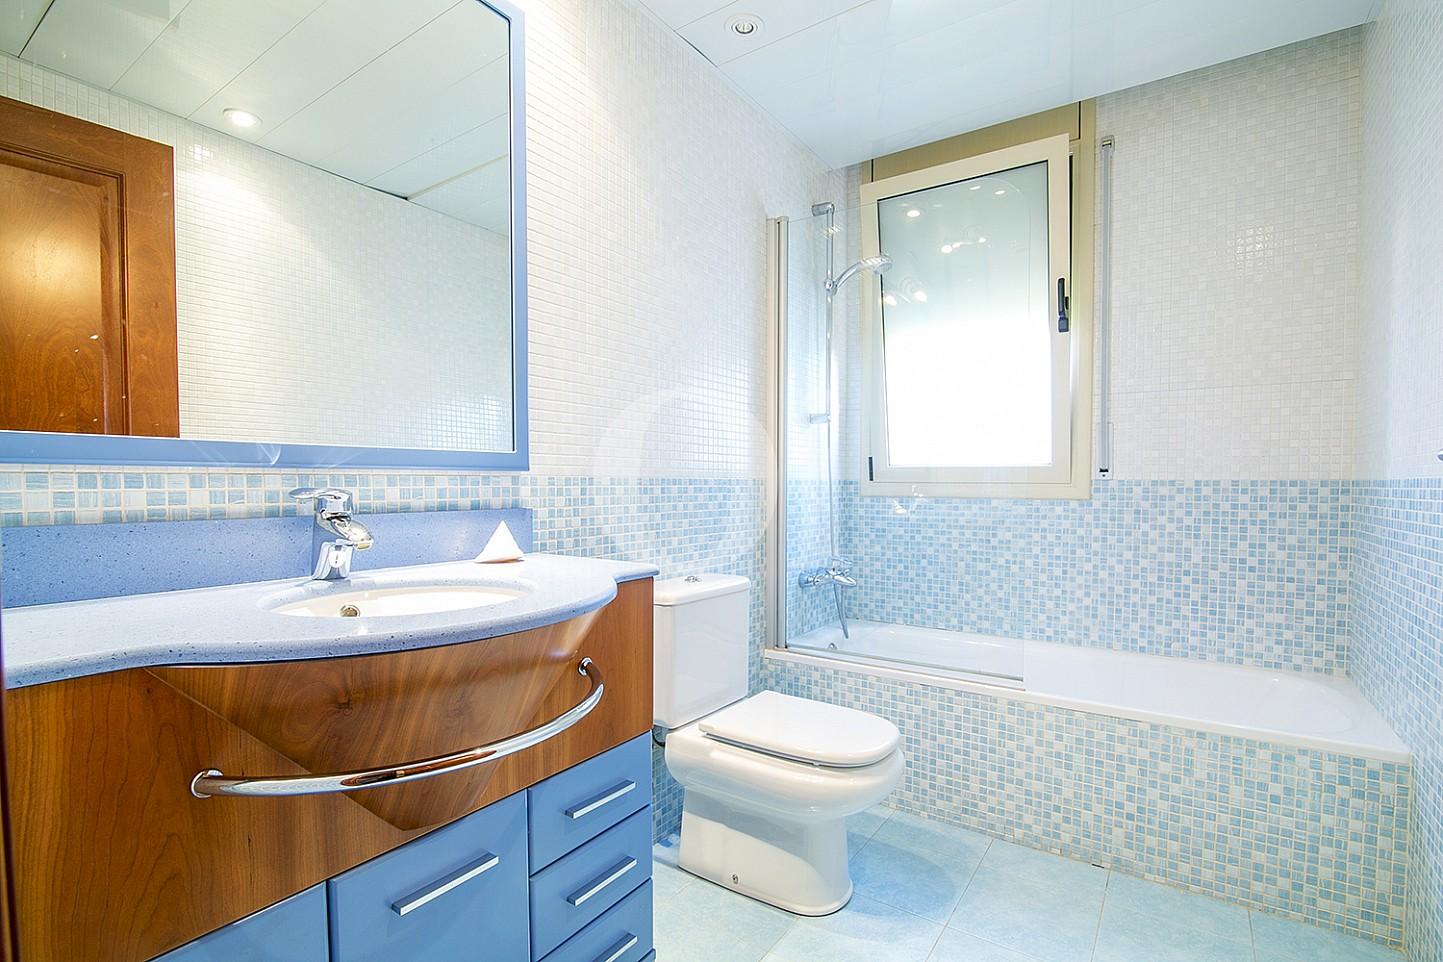 Baño con bañera de maravillosa casa en venta en Mongat, Maresme